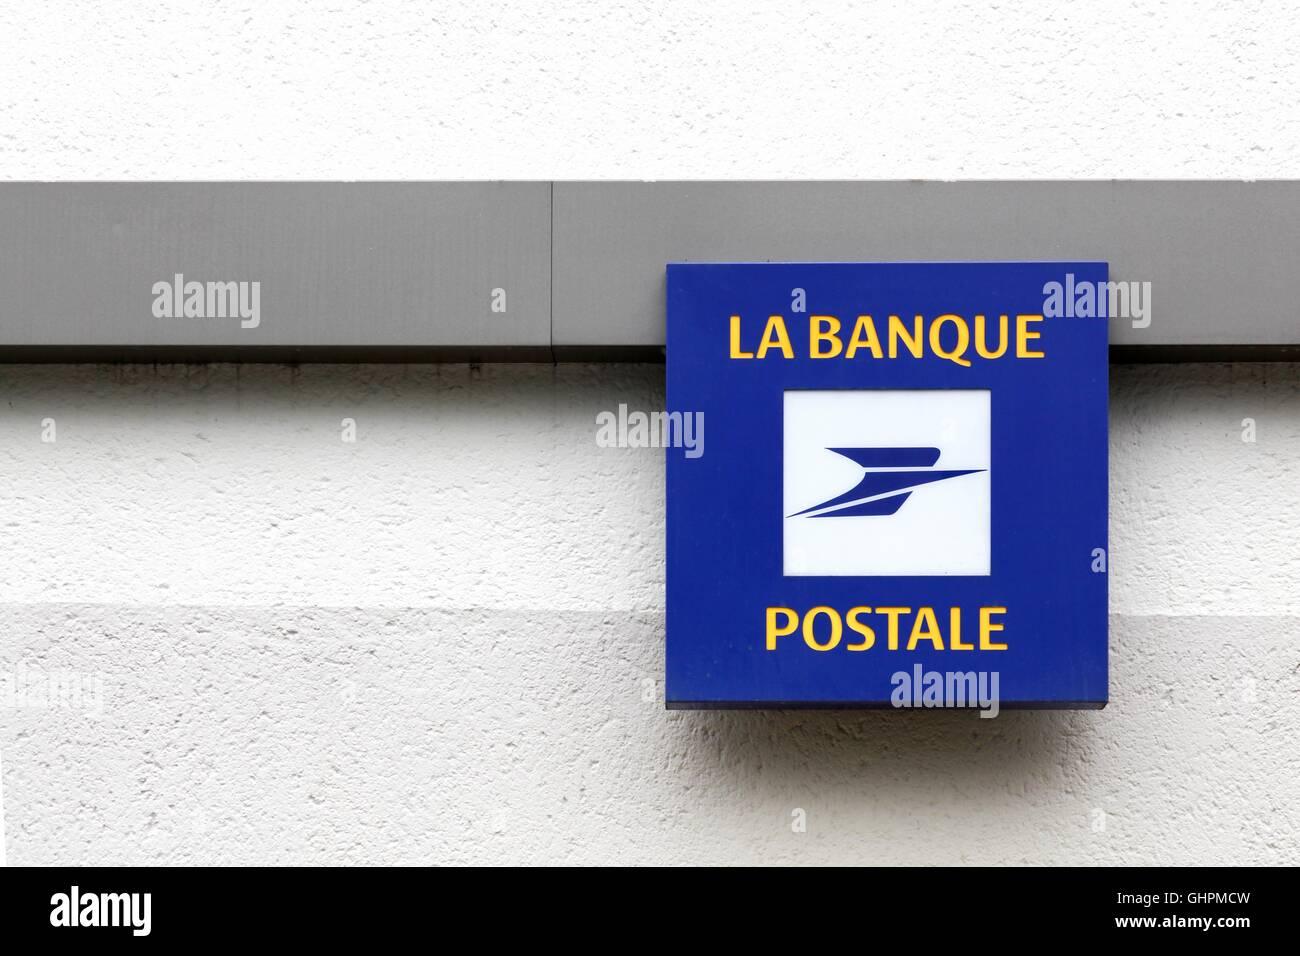 La Banque Postale France Stock Photos & La Banque Postale France Stock Images - Alamy